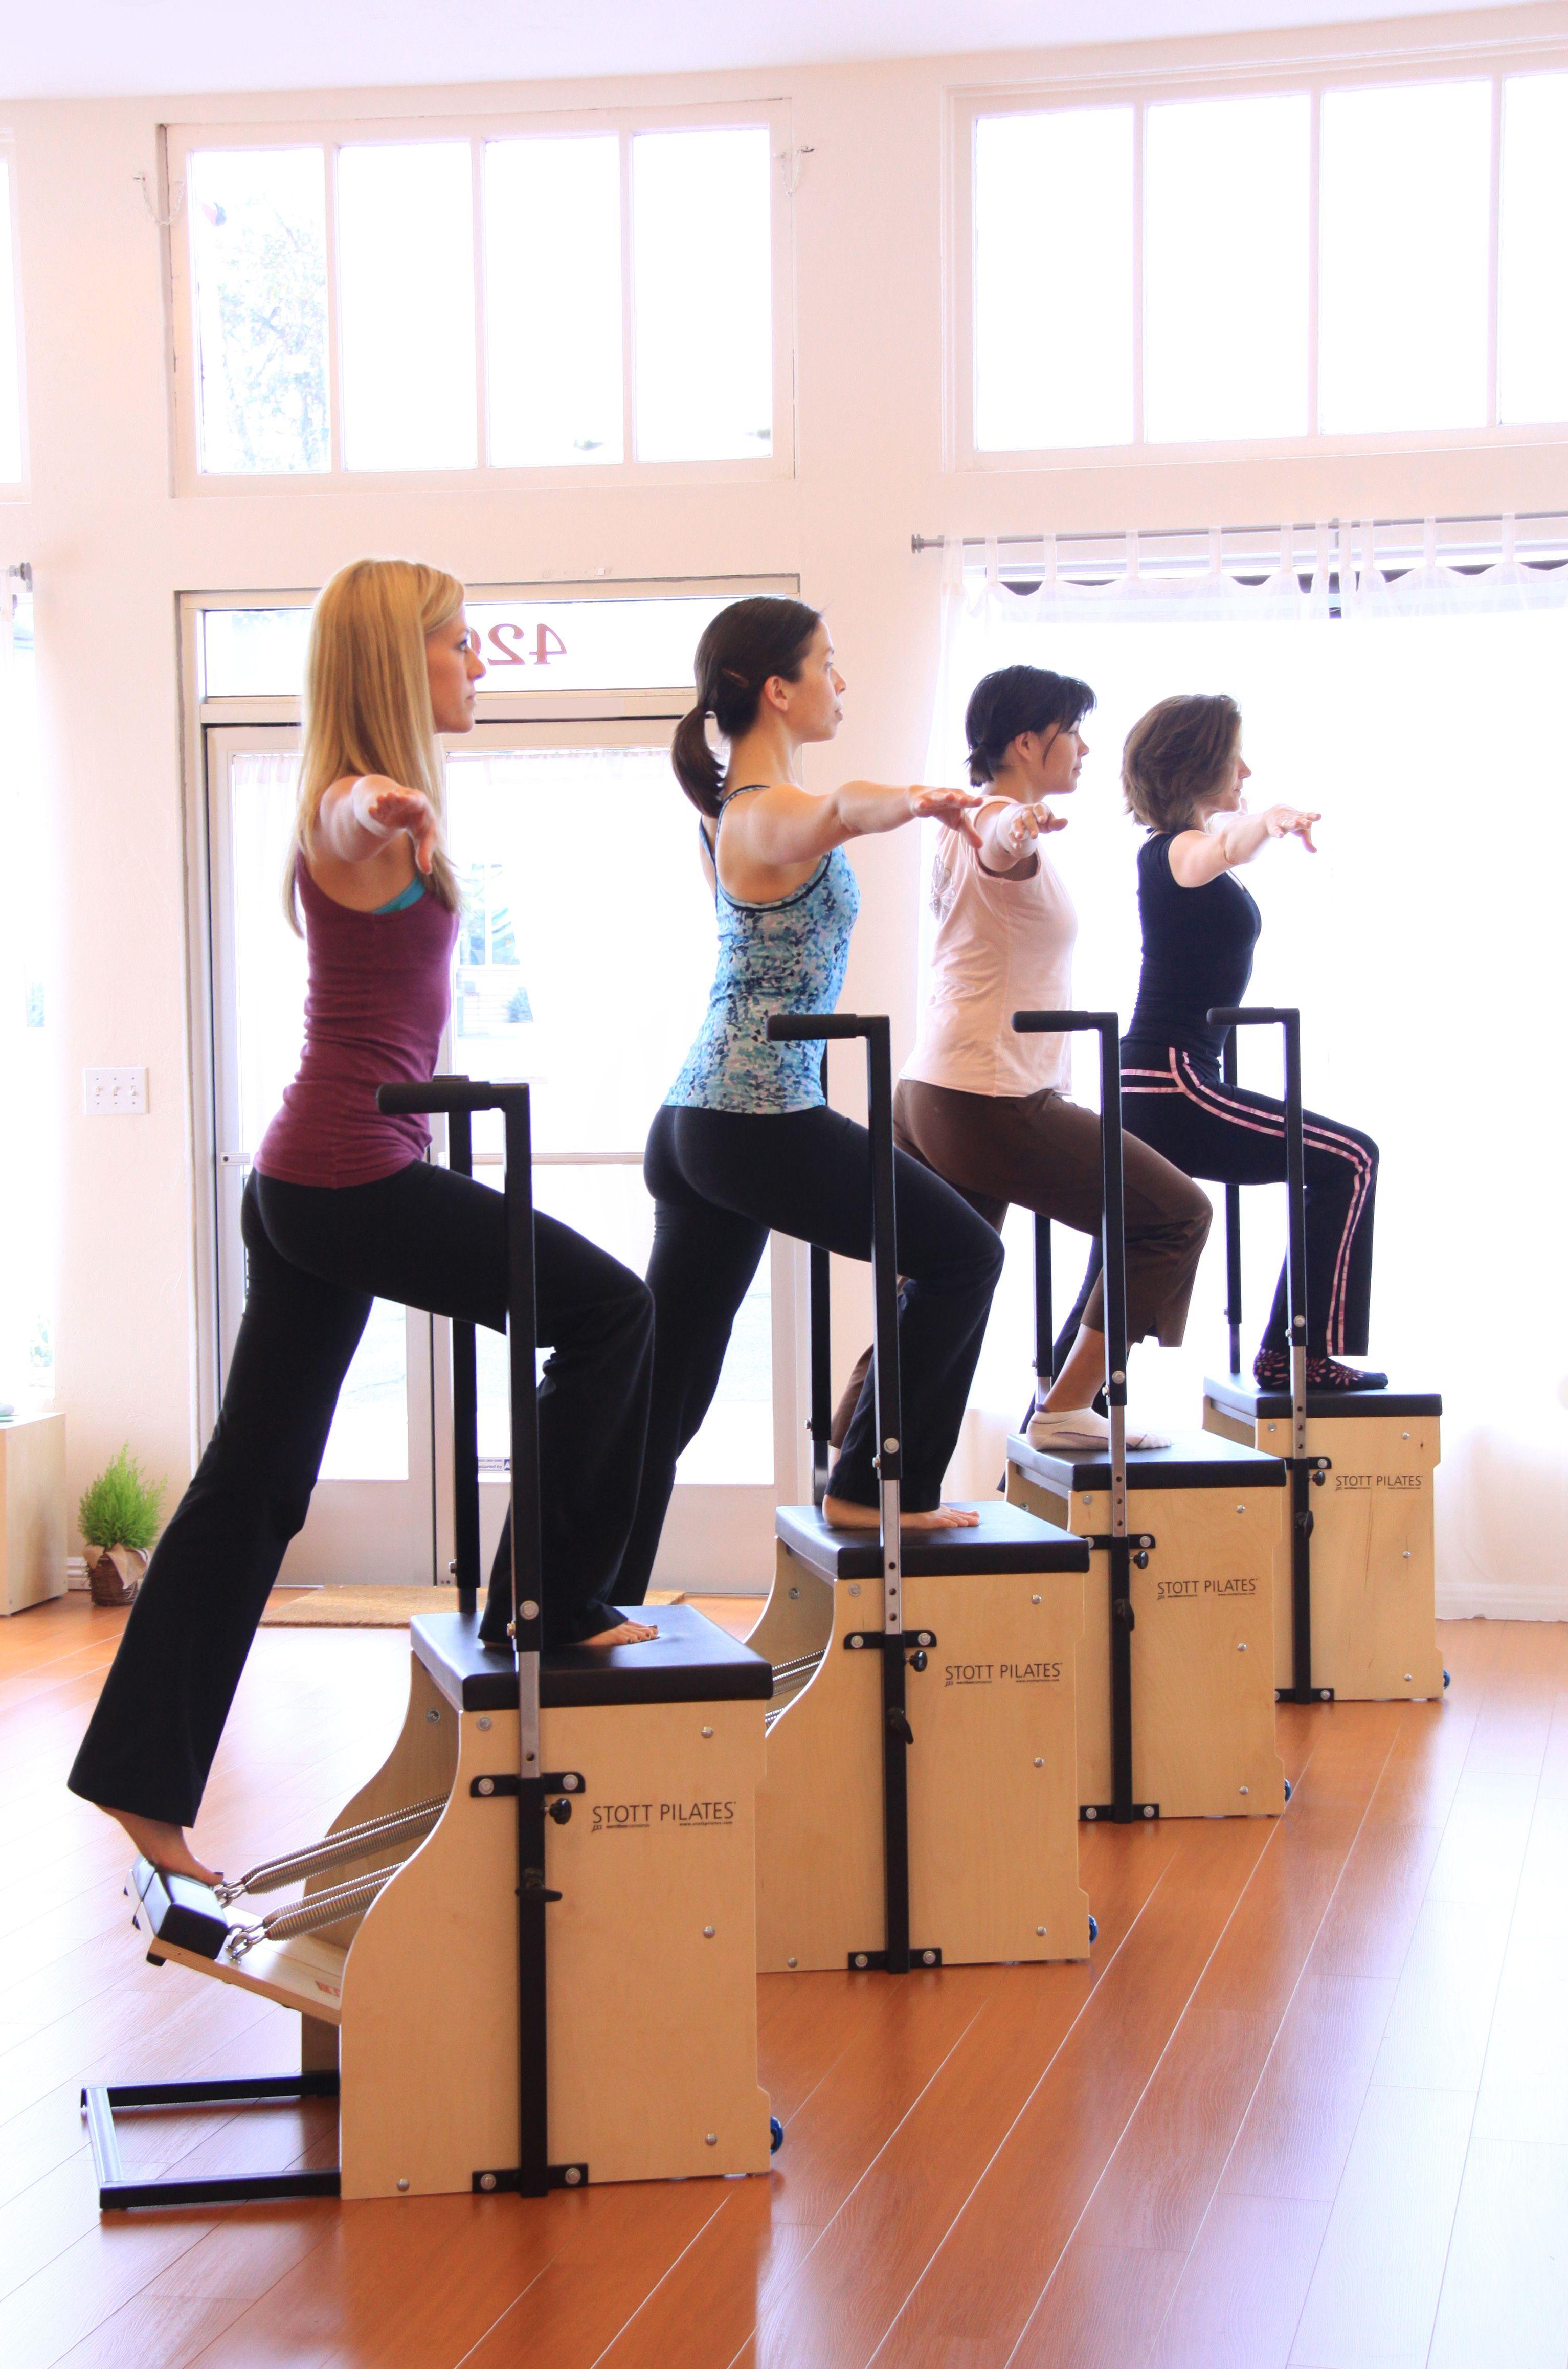 Pilates malibu chair buy malibu chair pilates combo - Pilates Video Wunda Chair